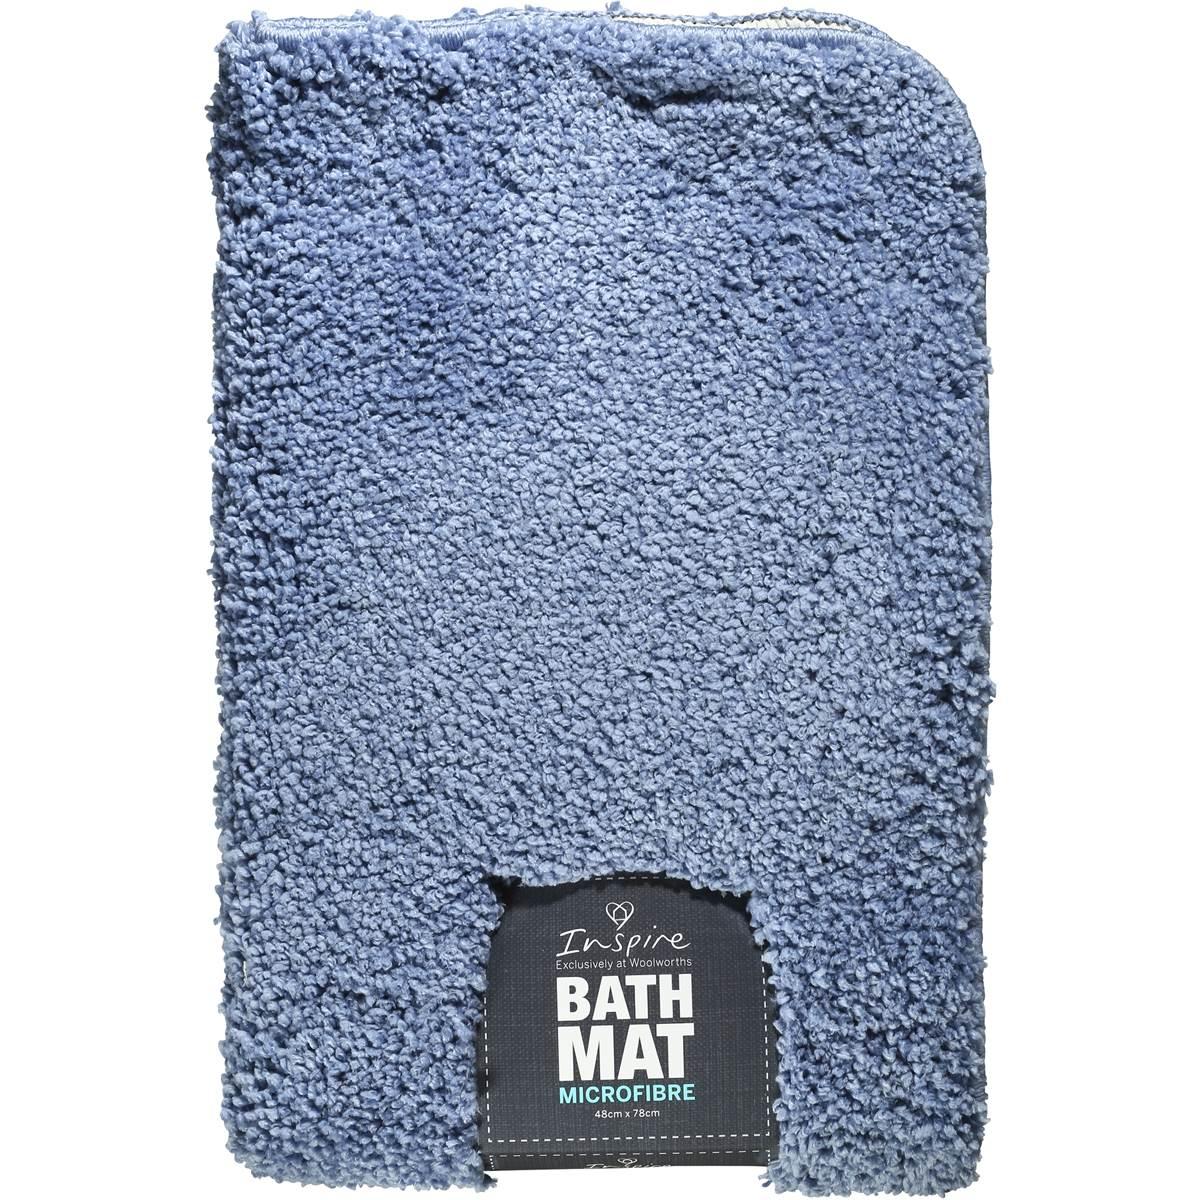 Woolworths Home Essentials Bath Mat Microfibre Blue 48x78cm Each Woolworths